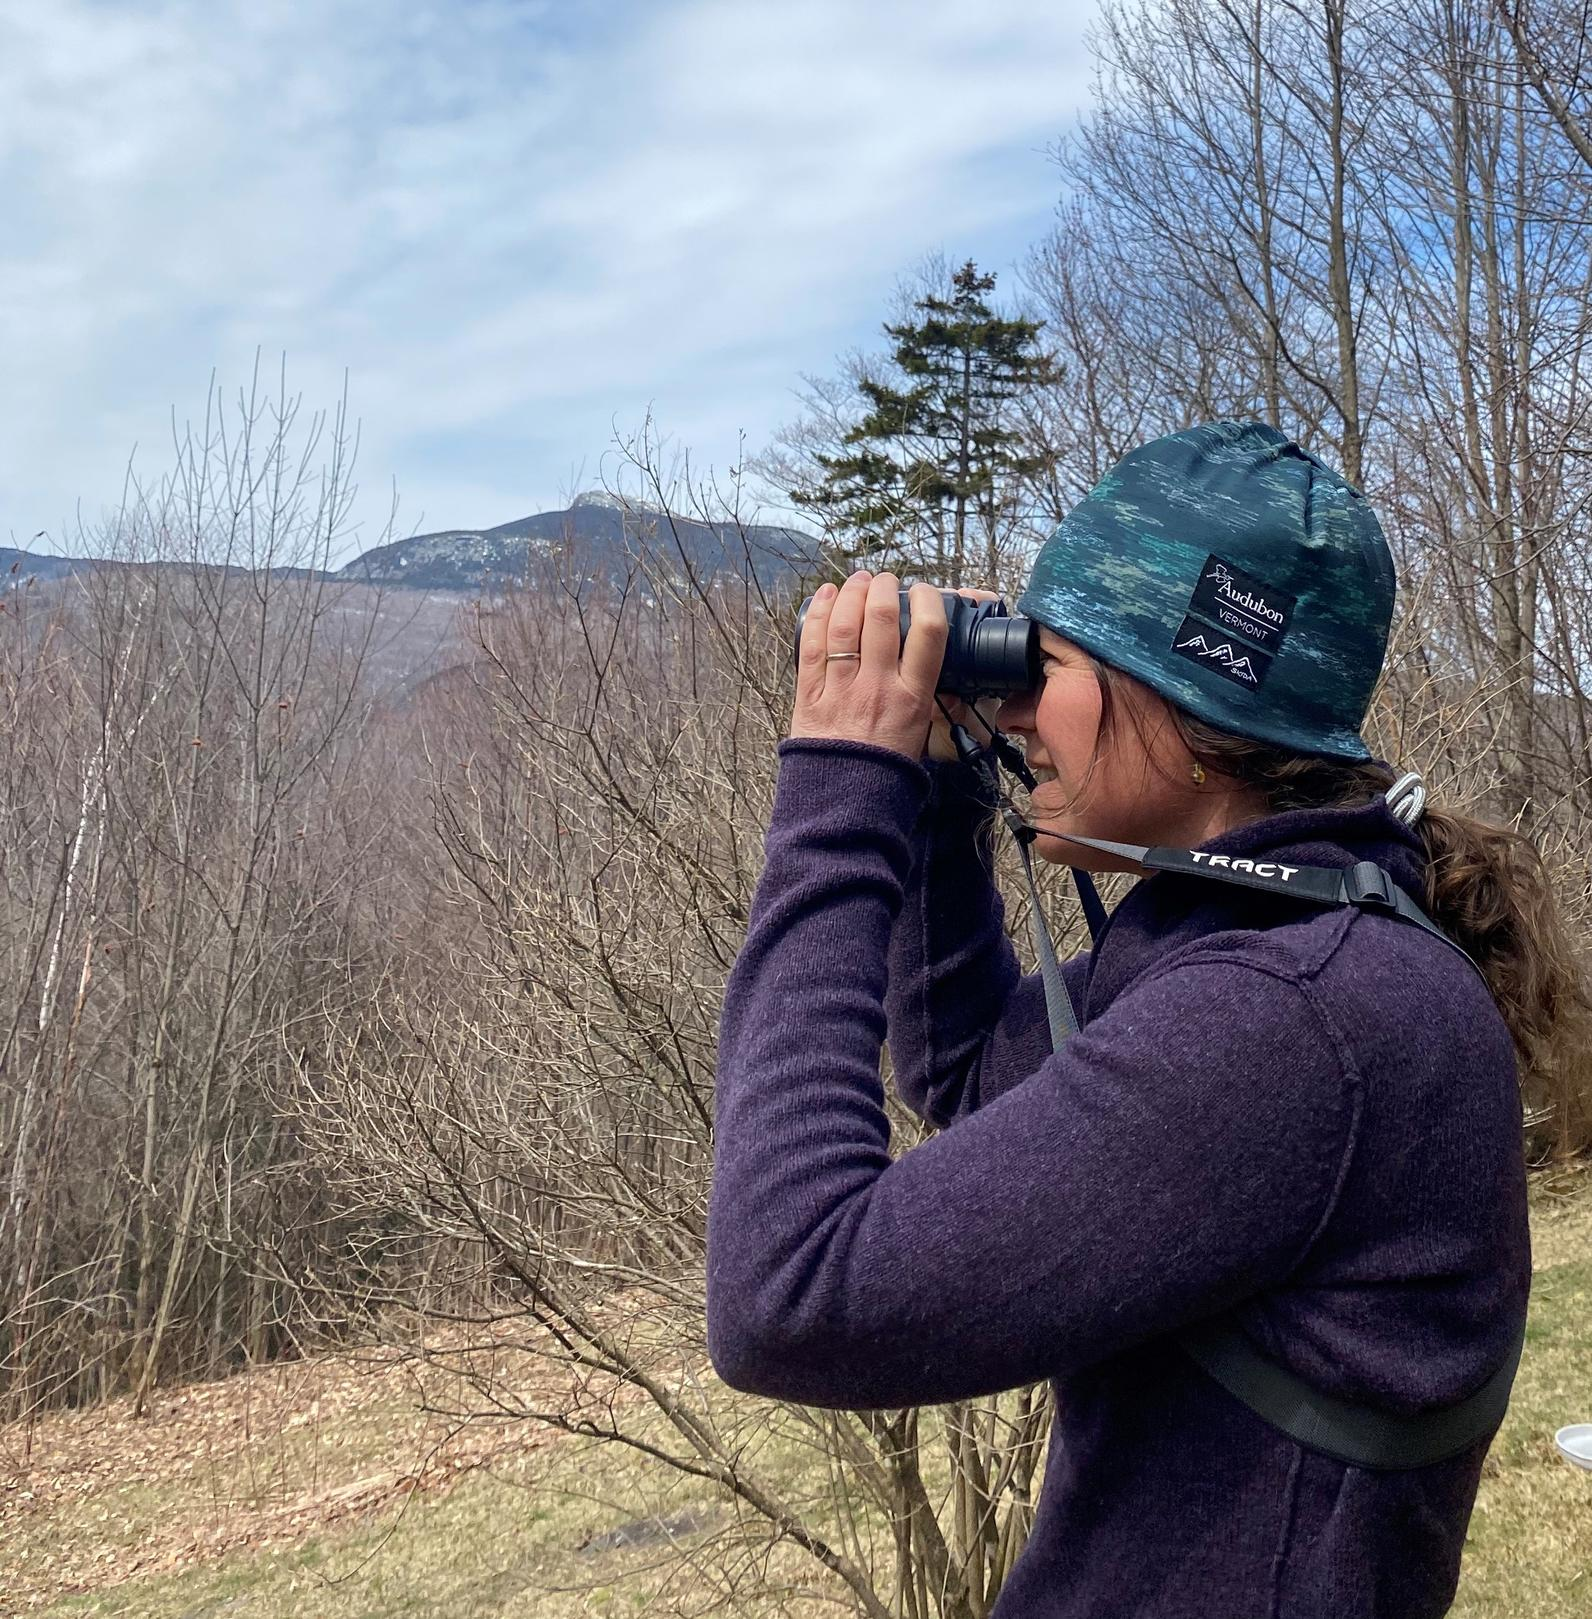 Kim uses binoculars mountains in background